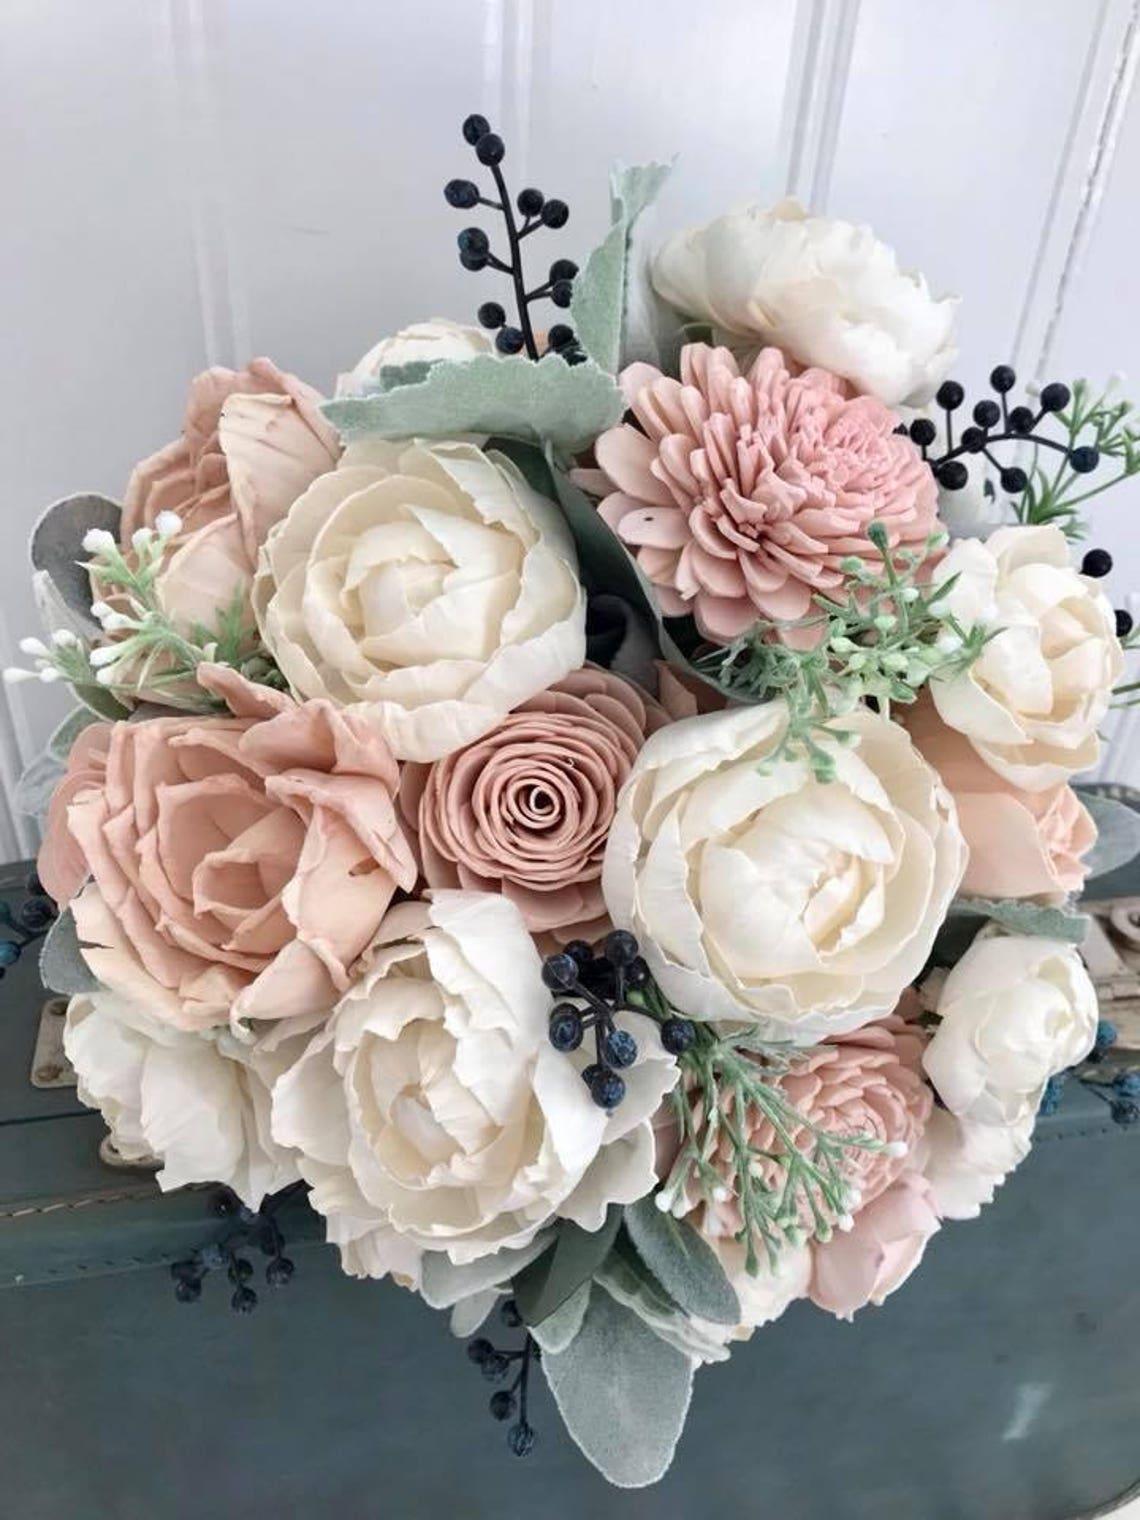 Sola flower bouquet blush pink sola wood flower wedding image 0